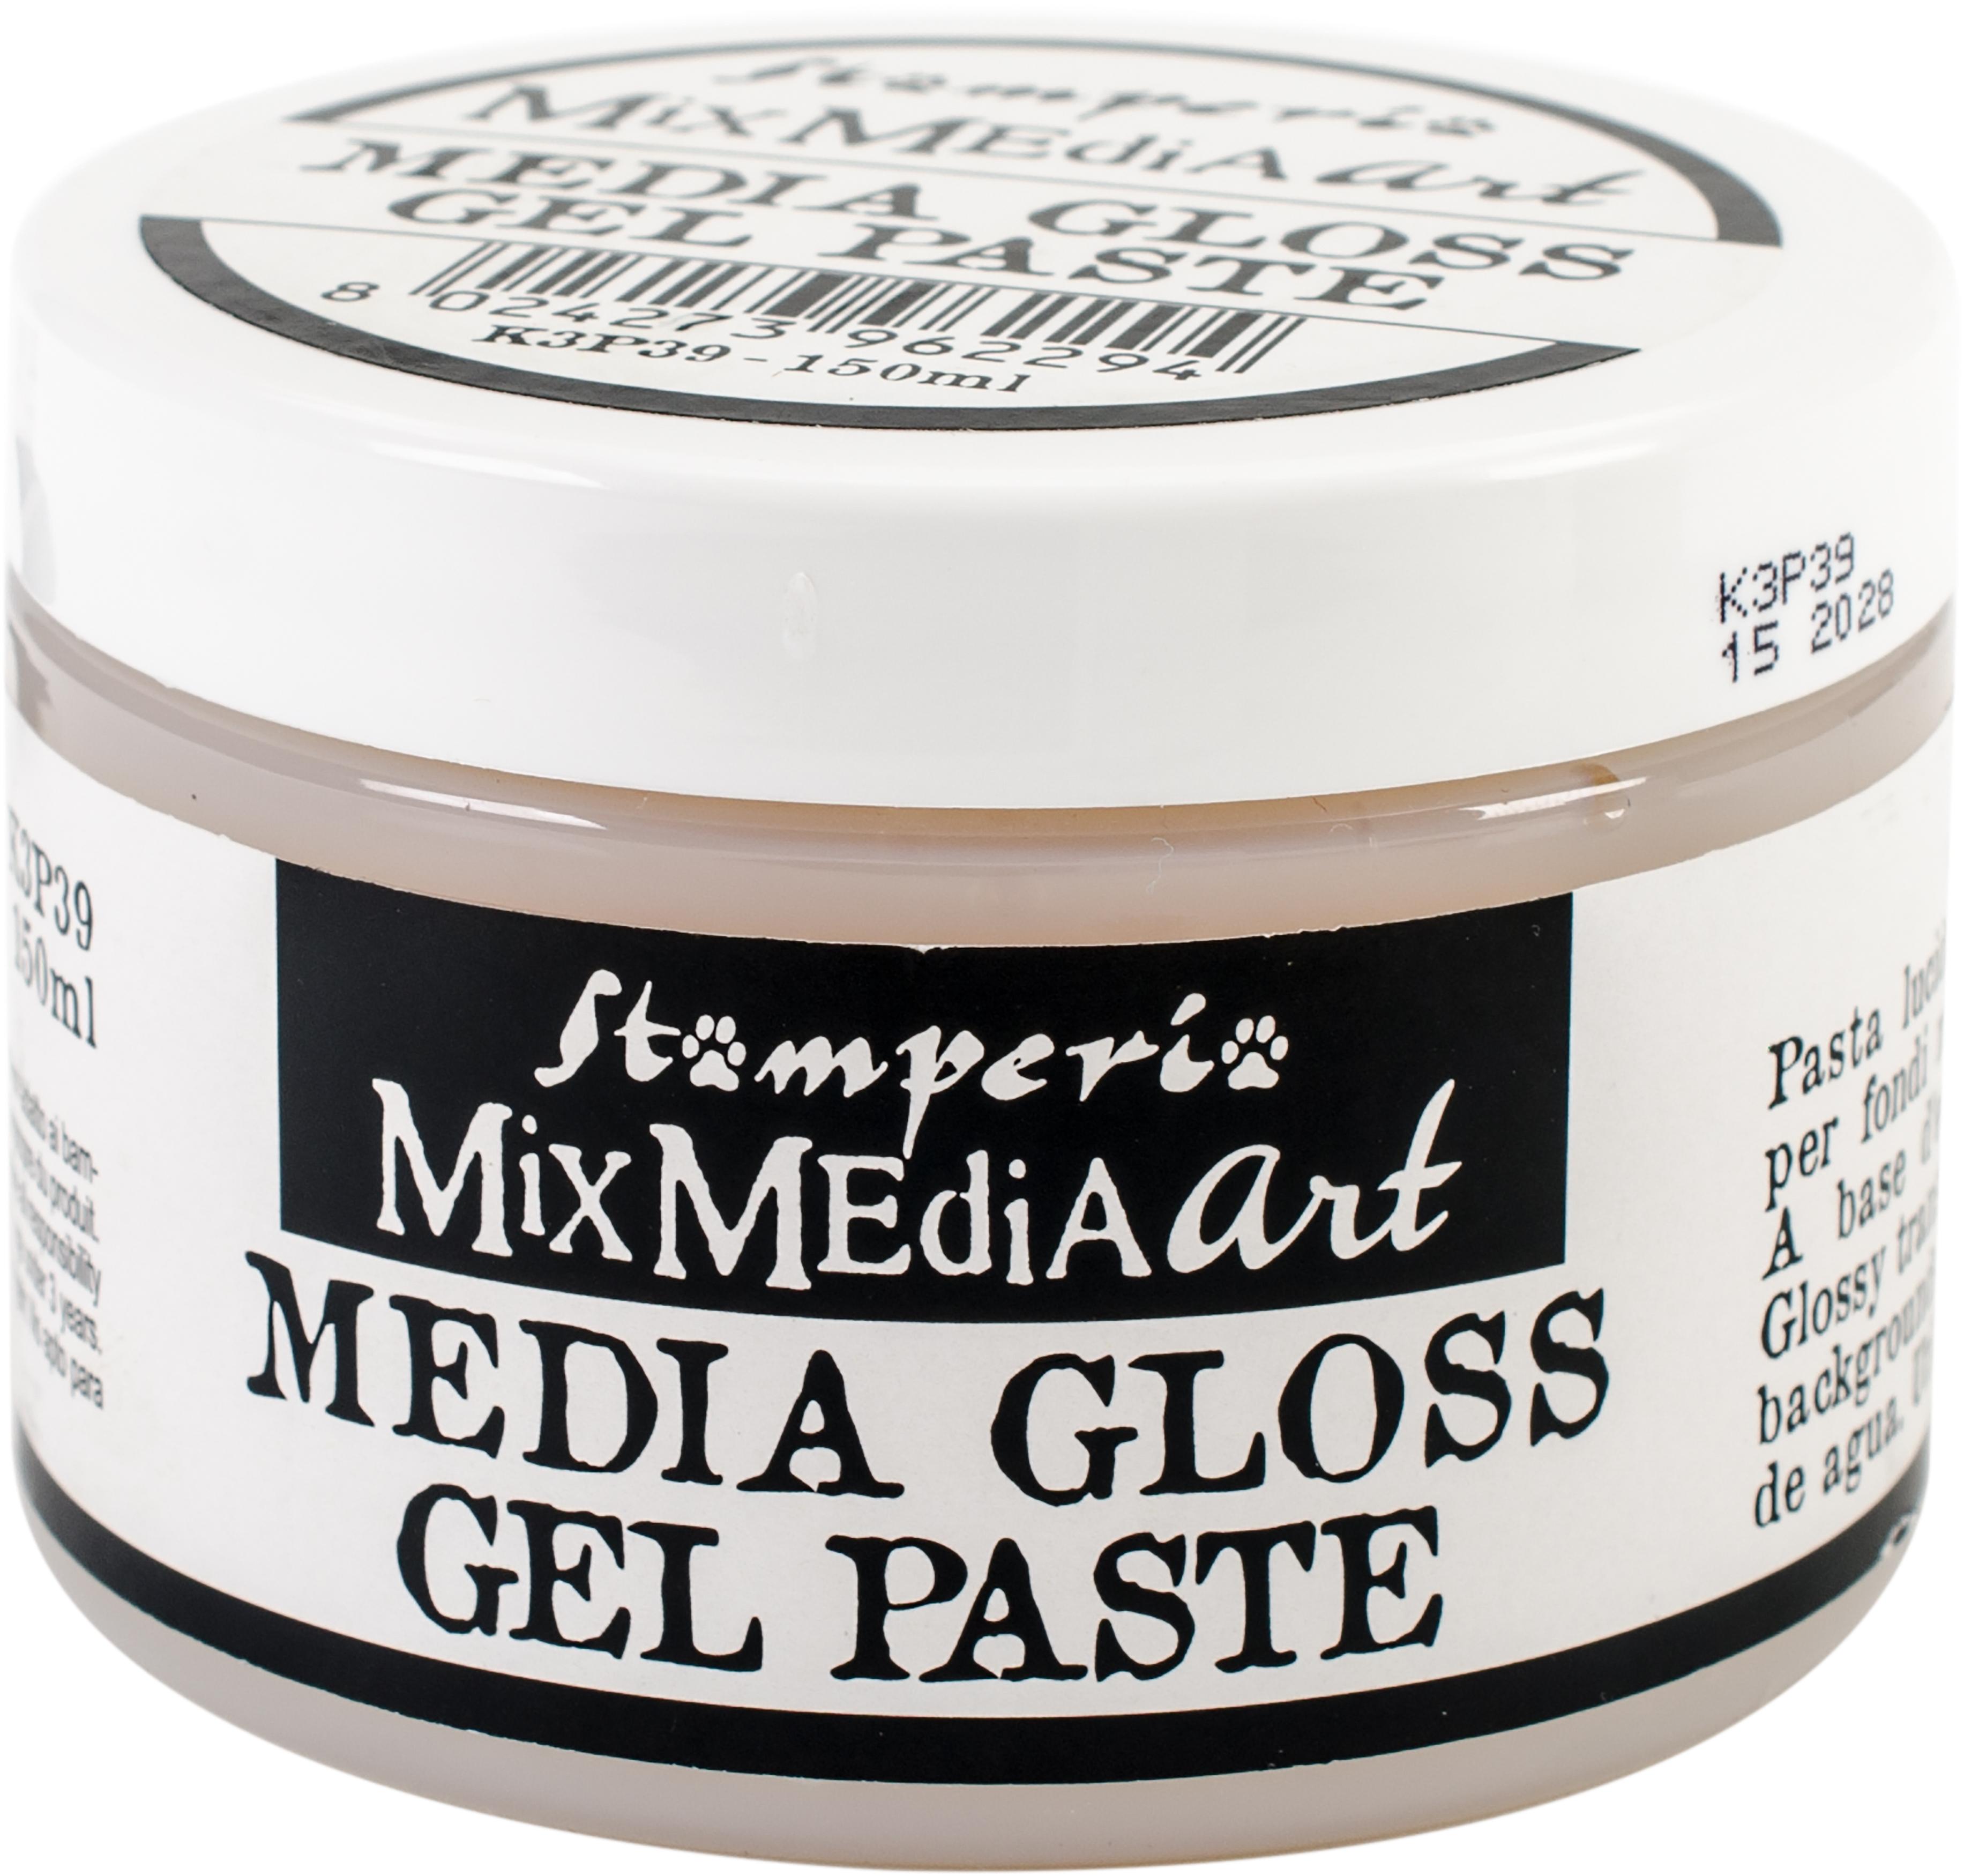 Mix Media Glue